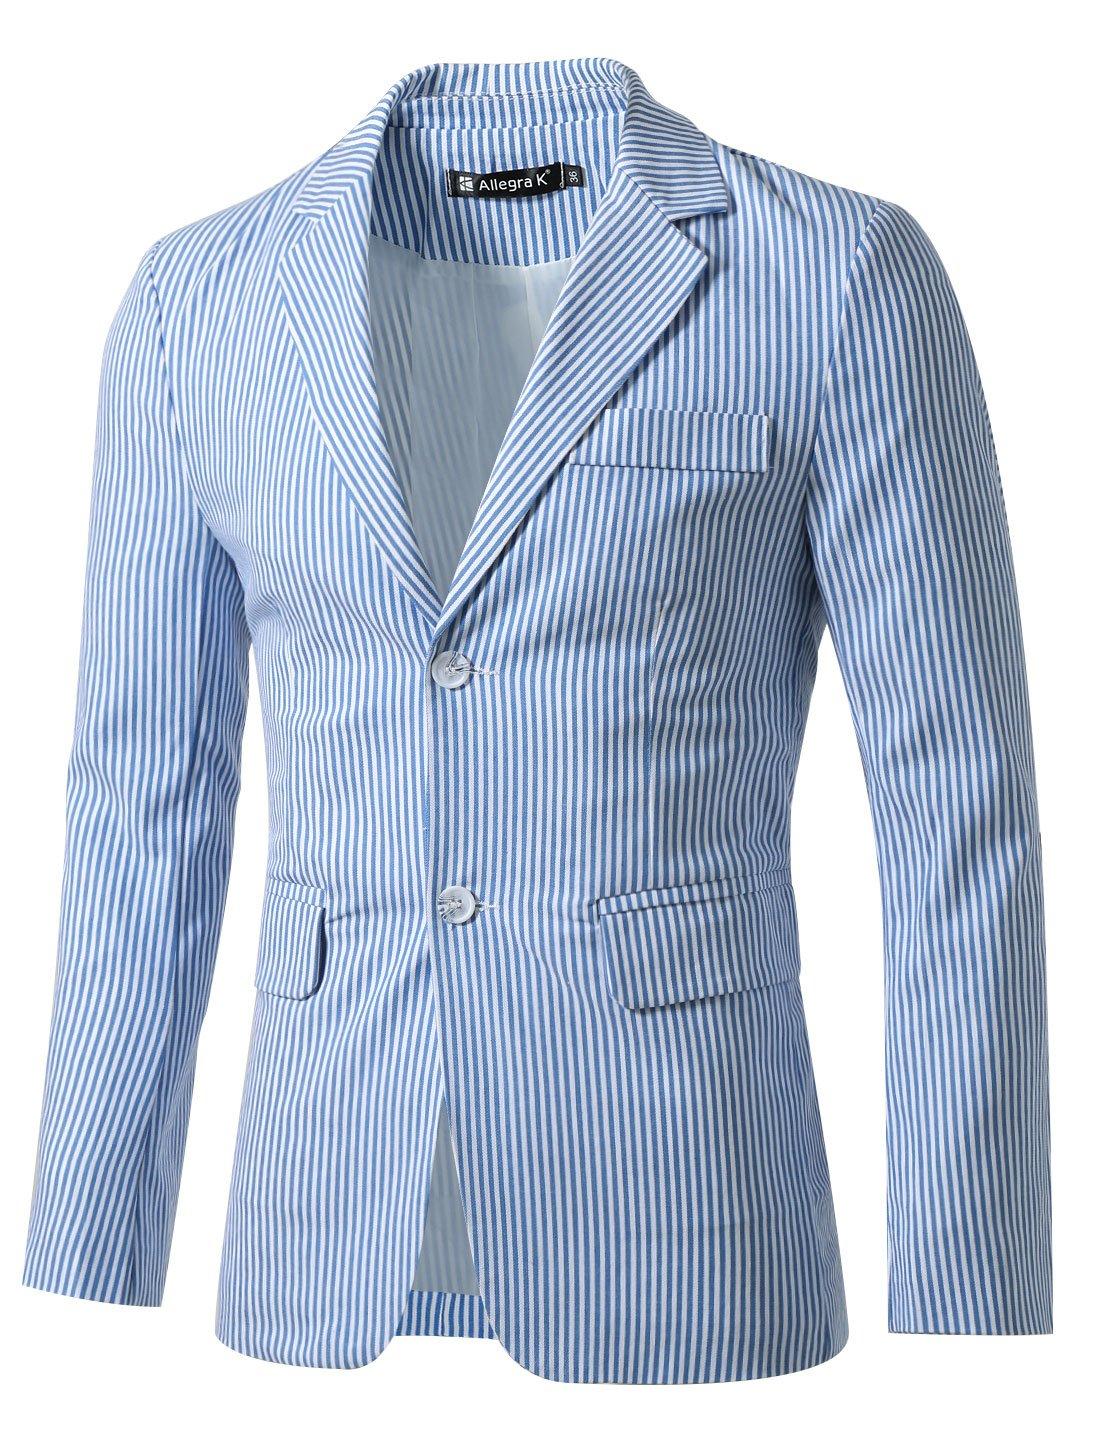 Allegra K Uomo strisce verticali intagliate bavero Manica lunga casual blazer blu bianco S Sourcingmap